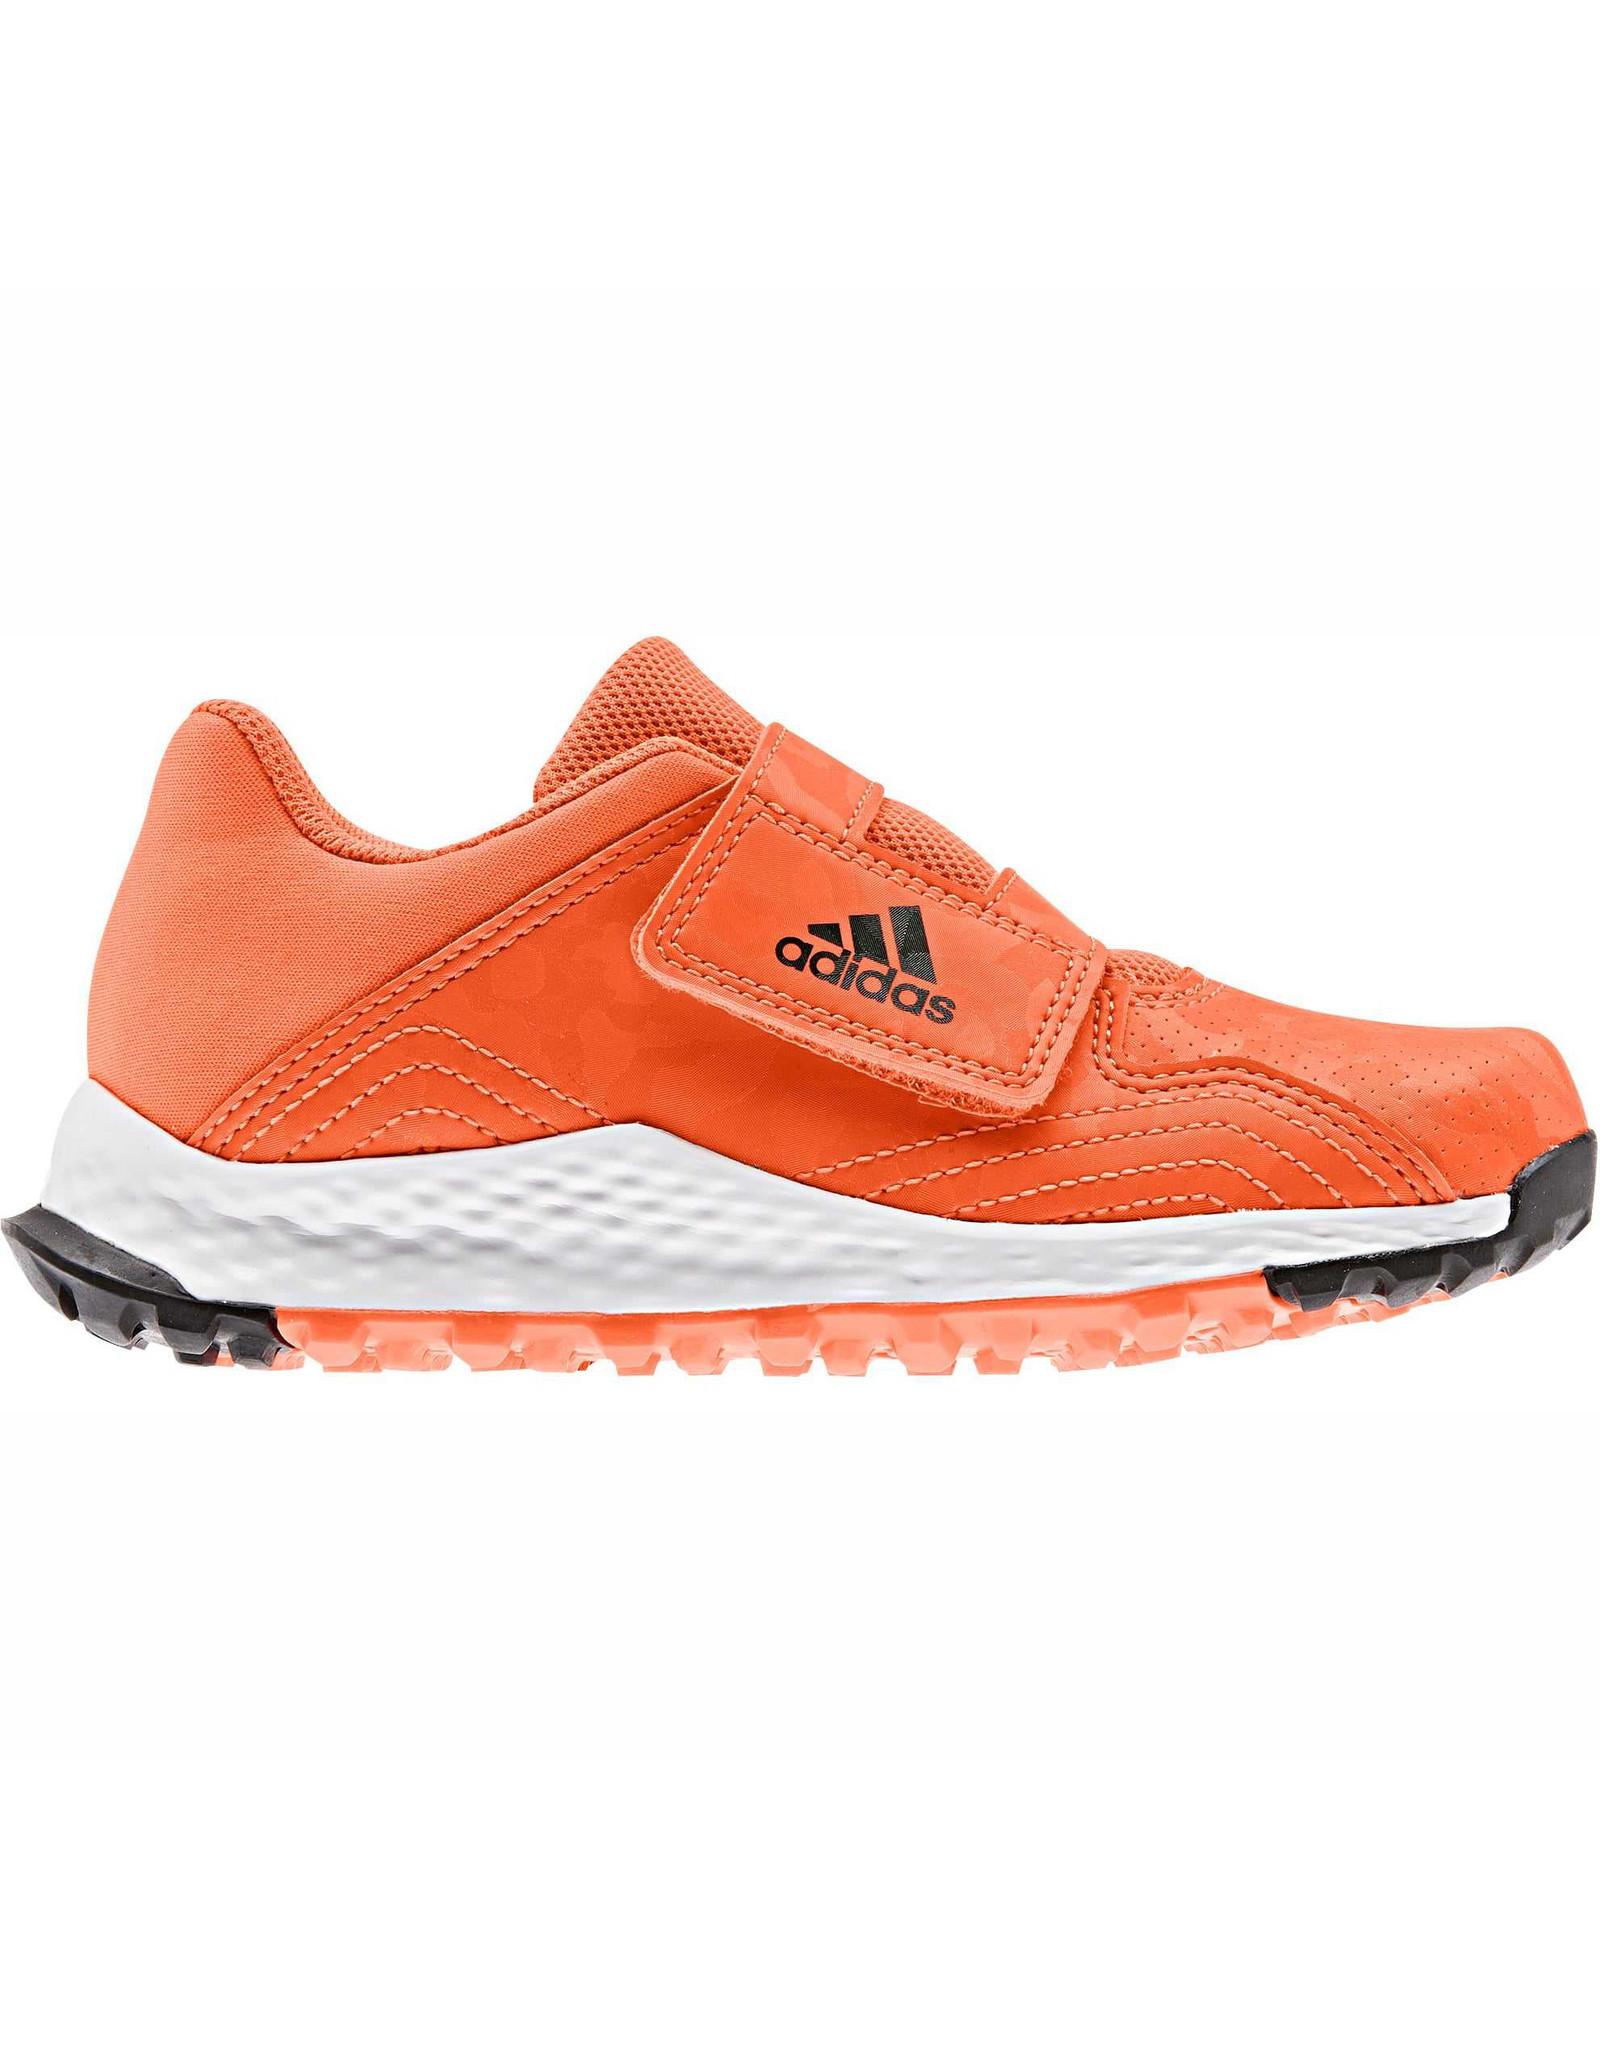 Adidas YOUNGSTAR VELCRO